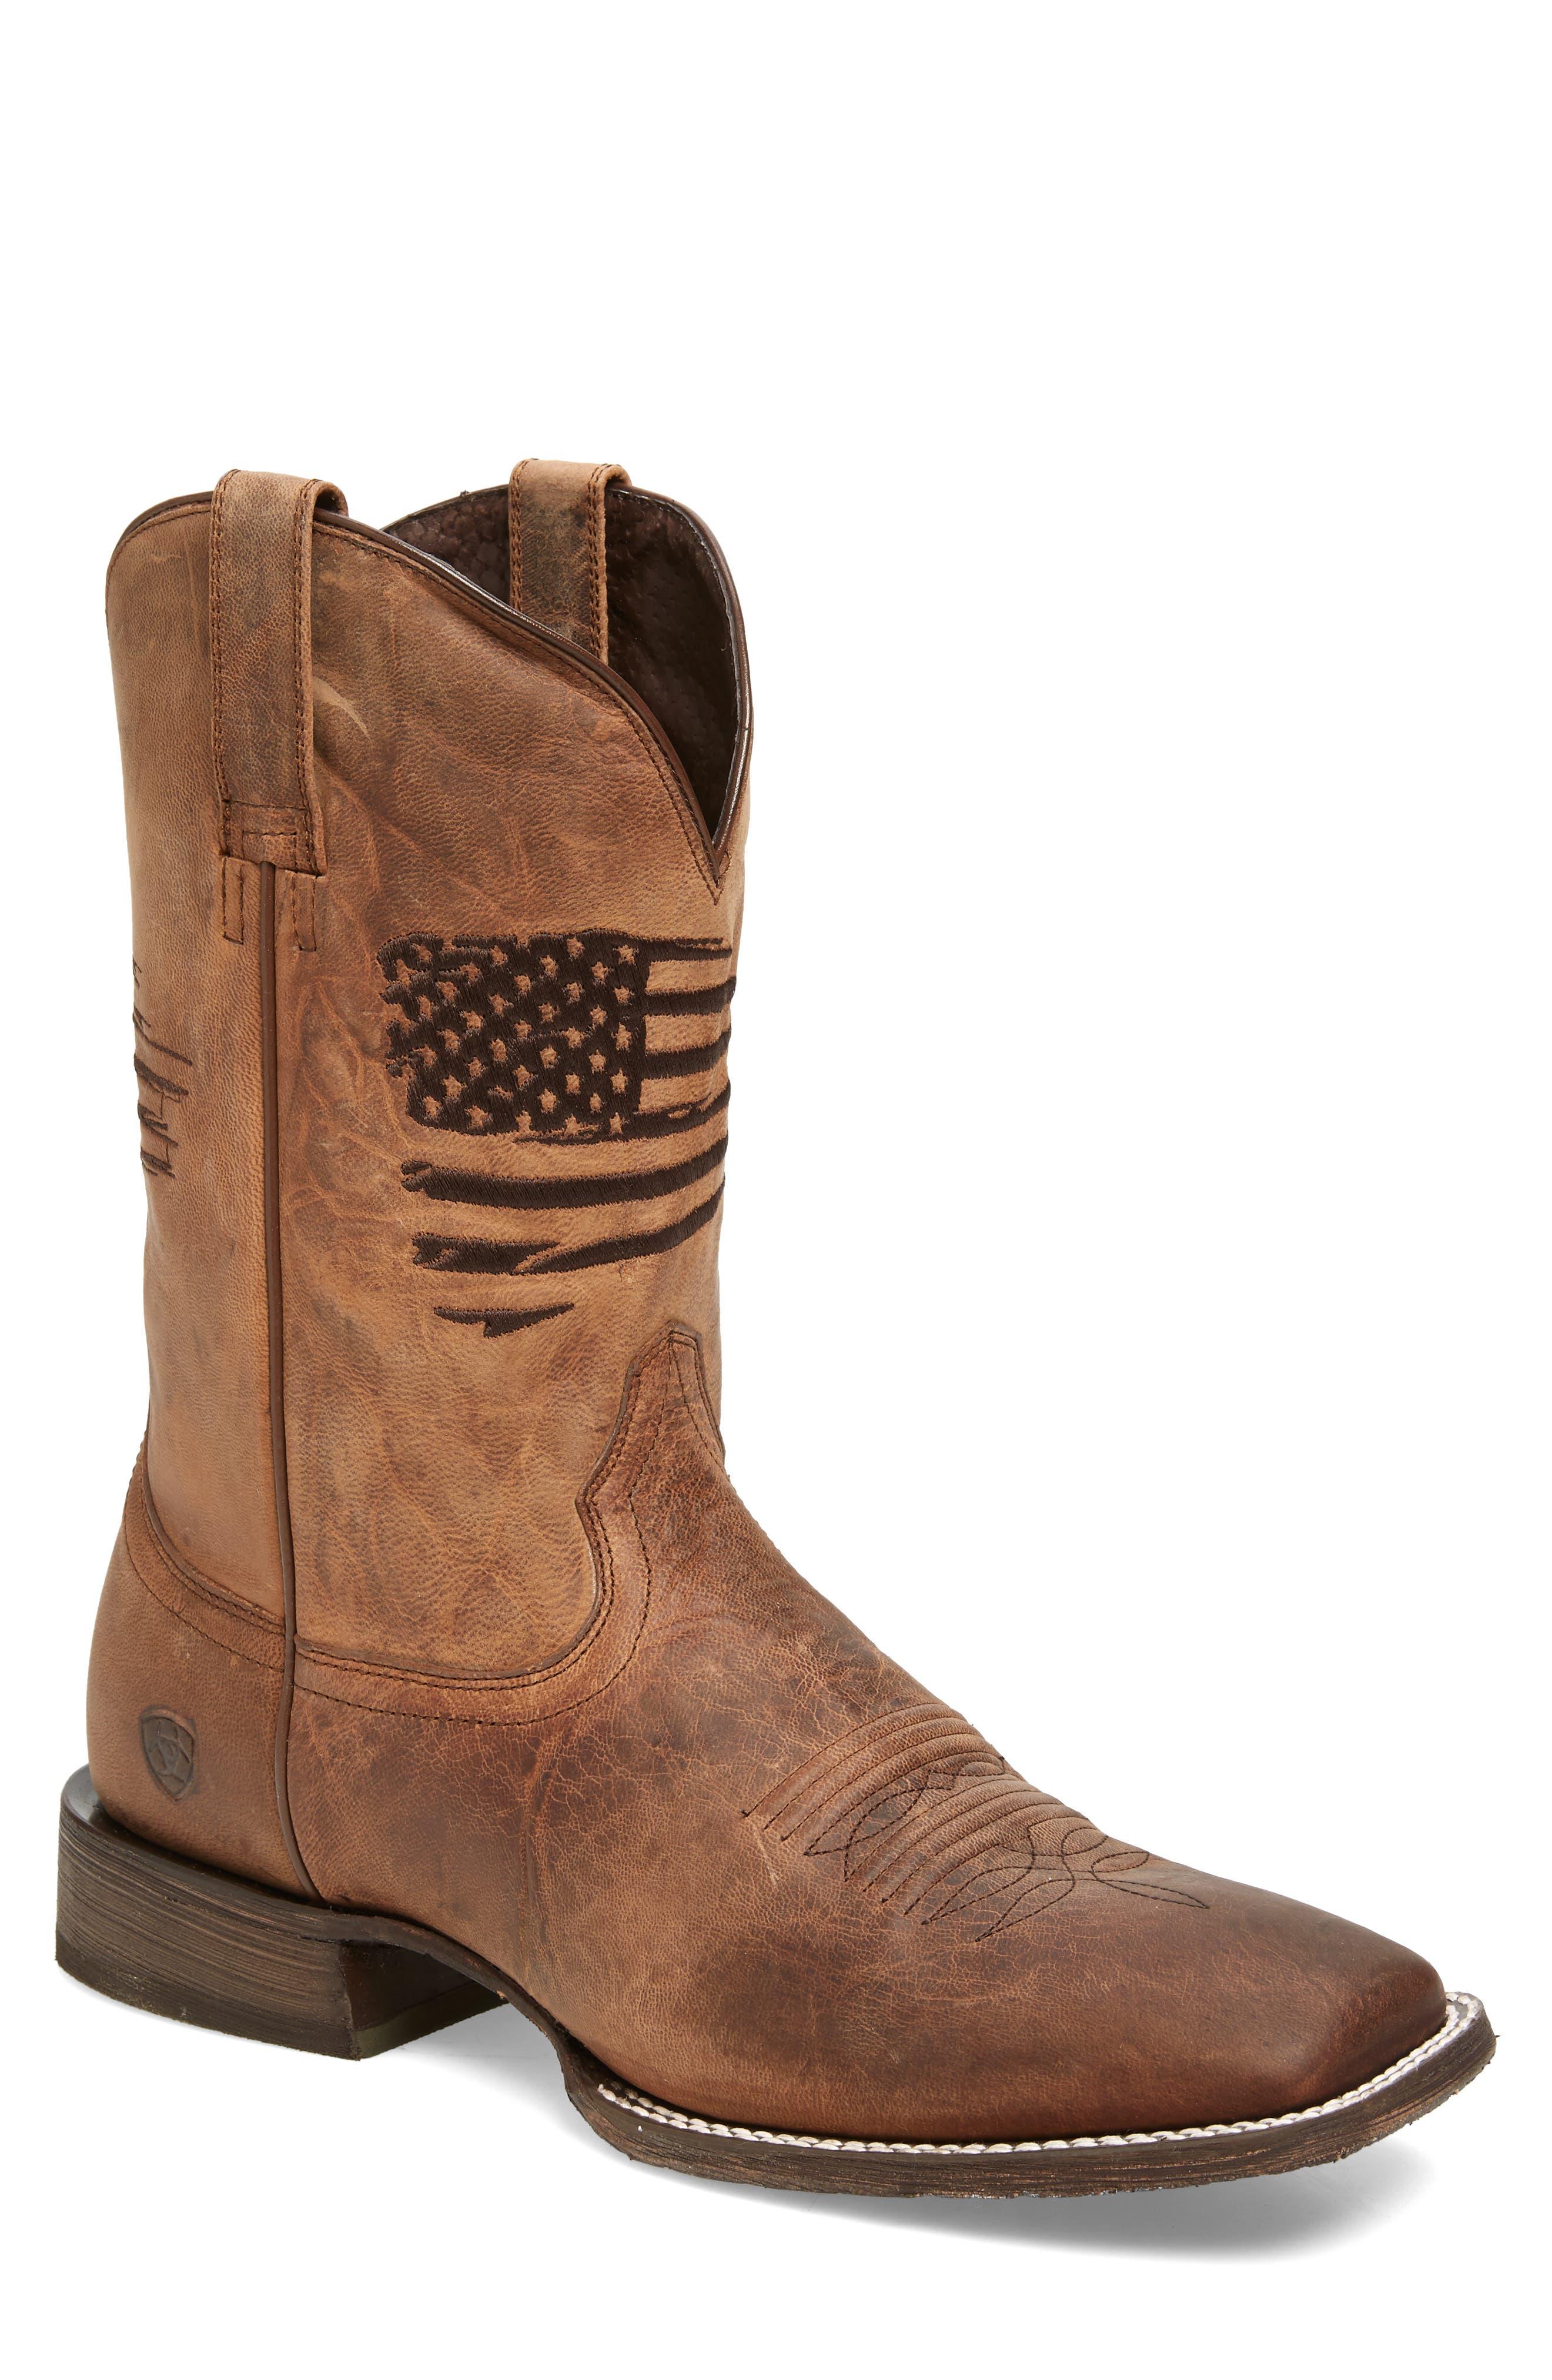 Circuit Patriot Cowboy Boot